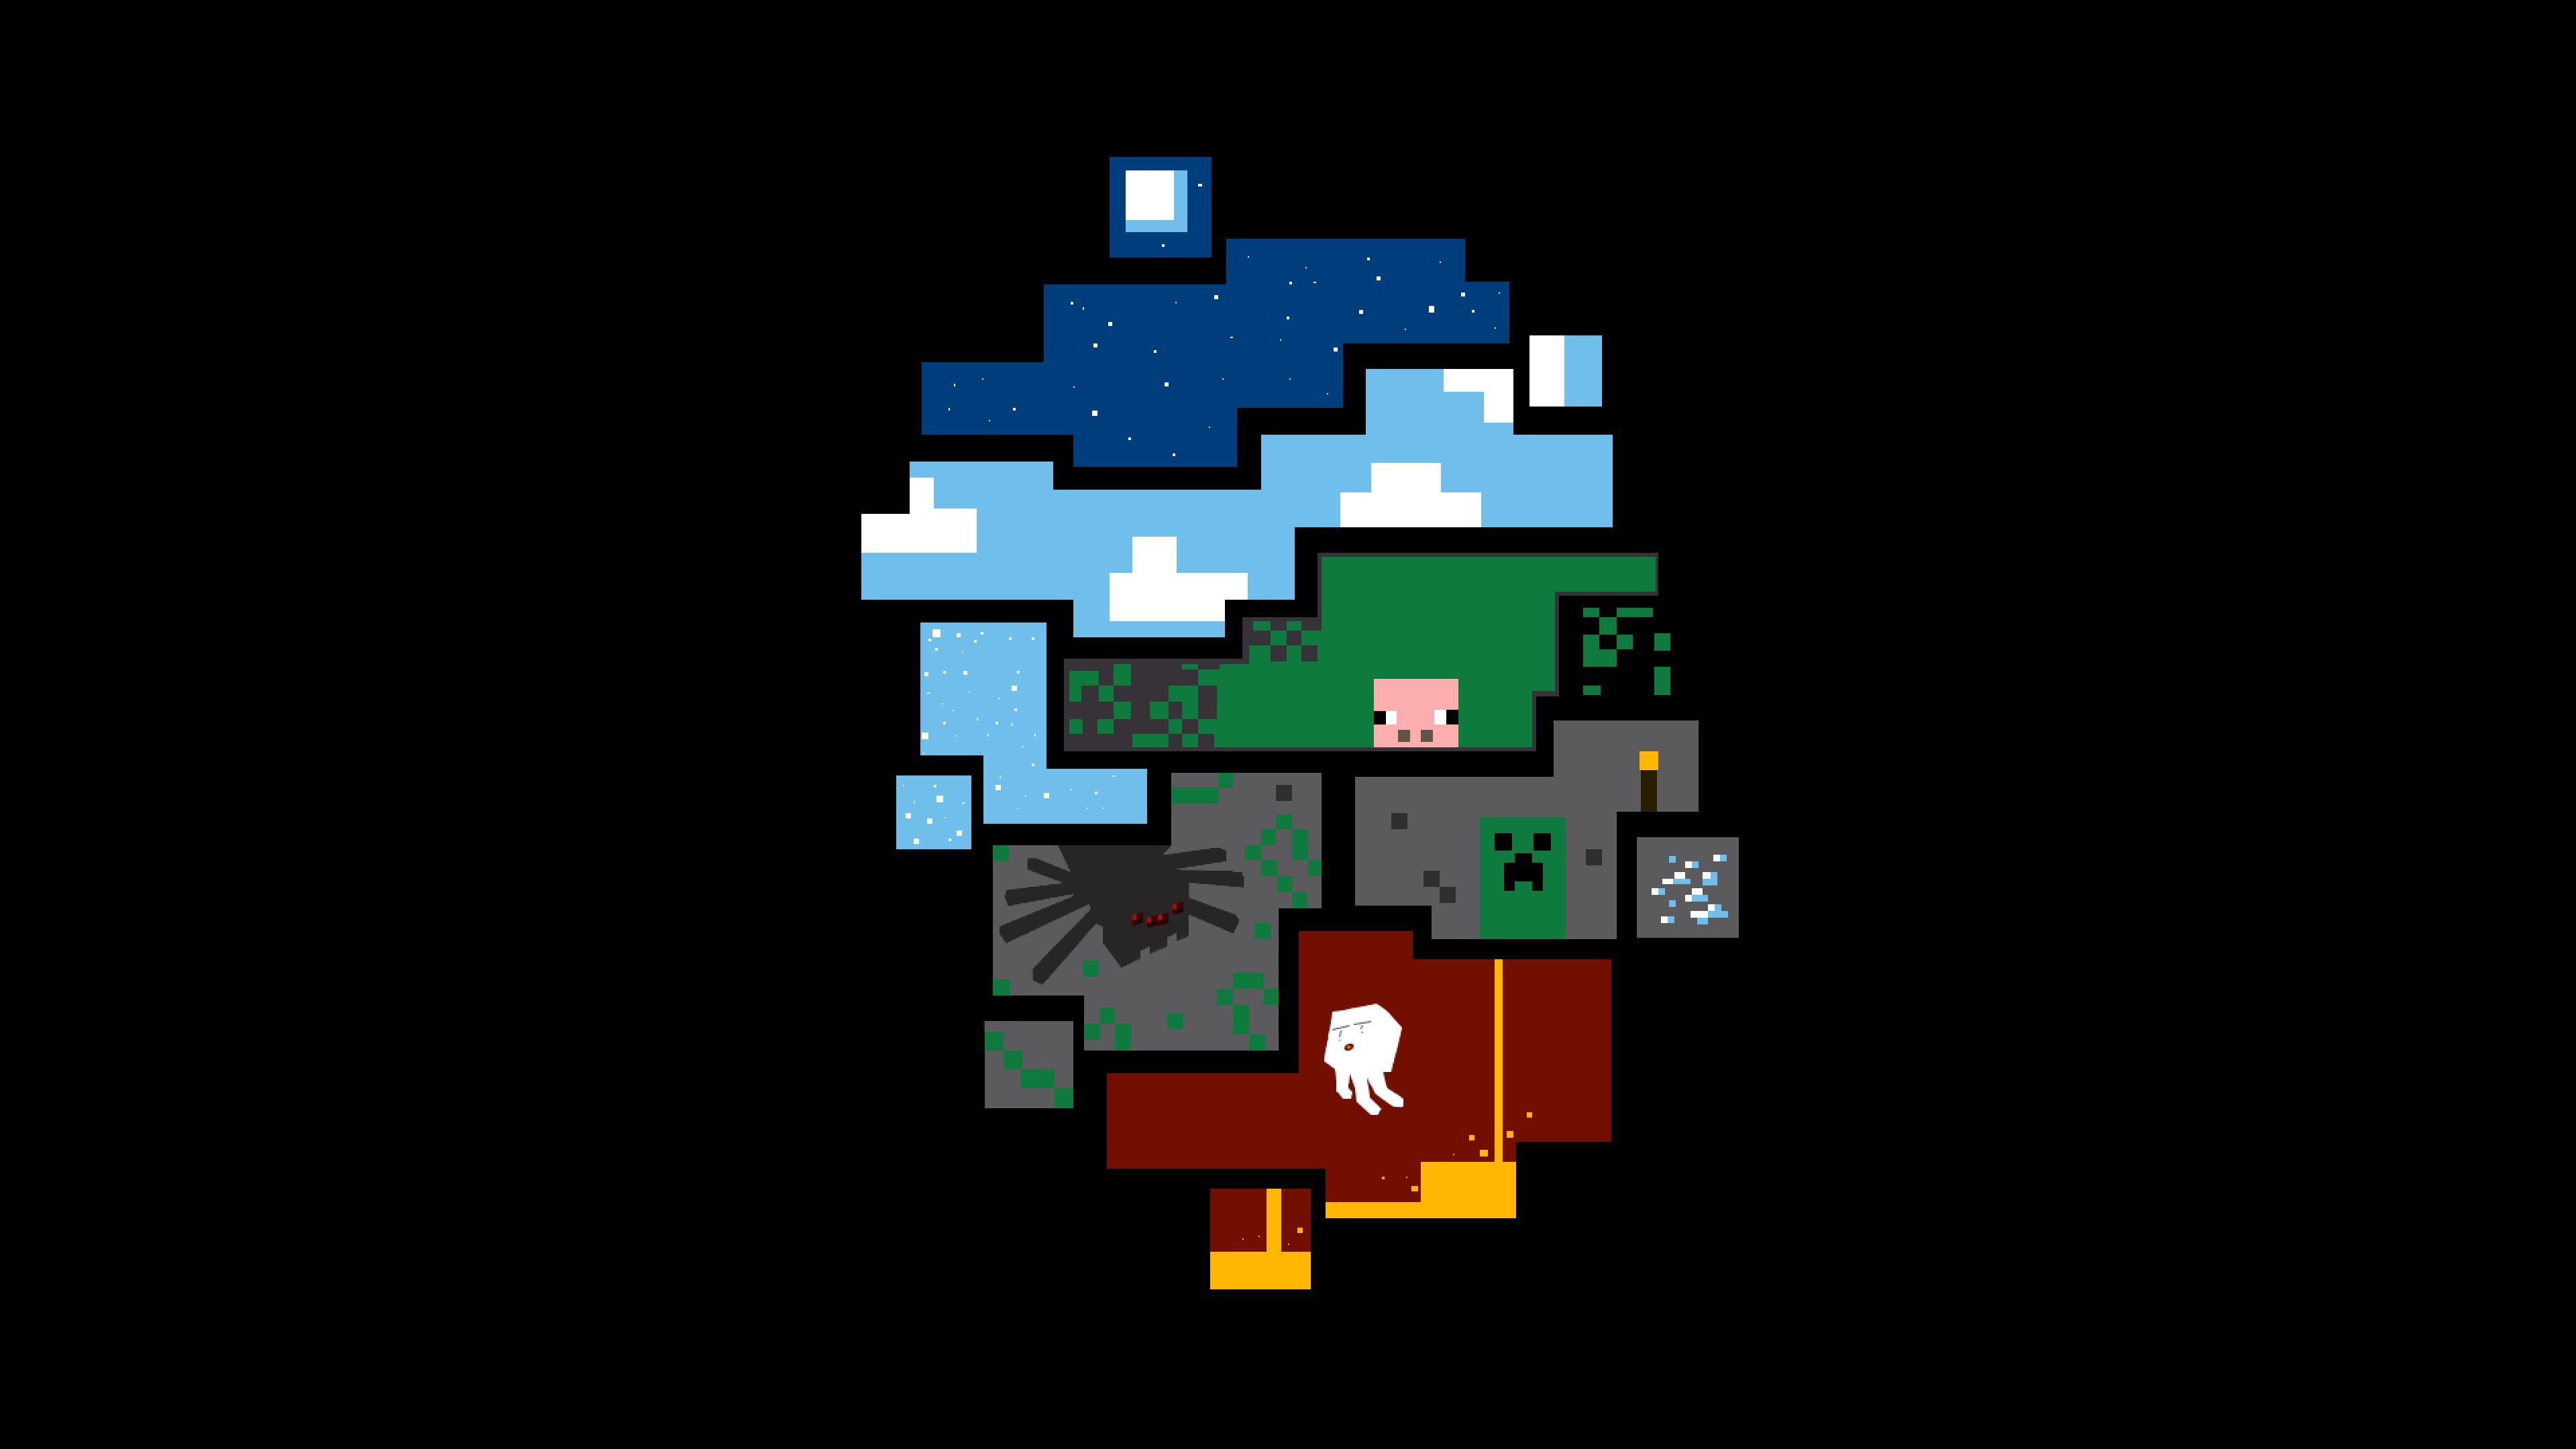 Minecraft desktop wallpaper free download